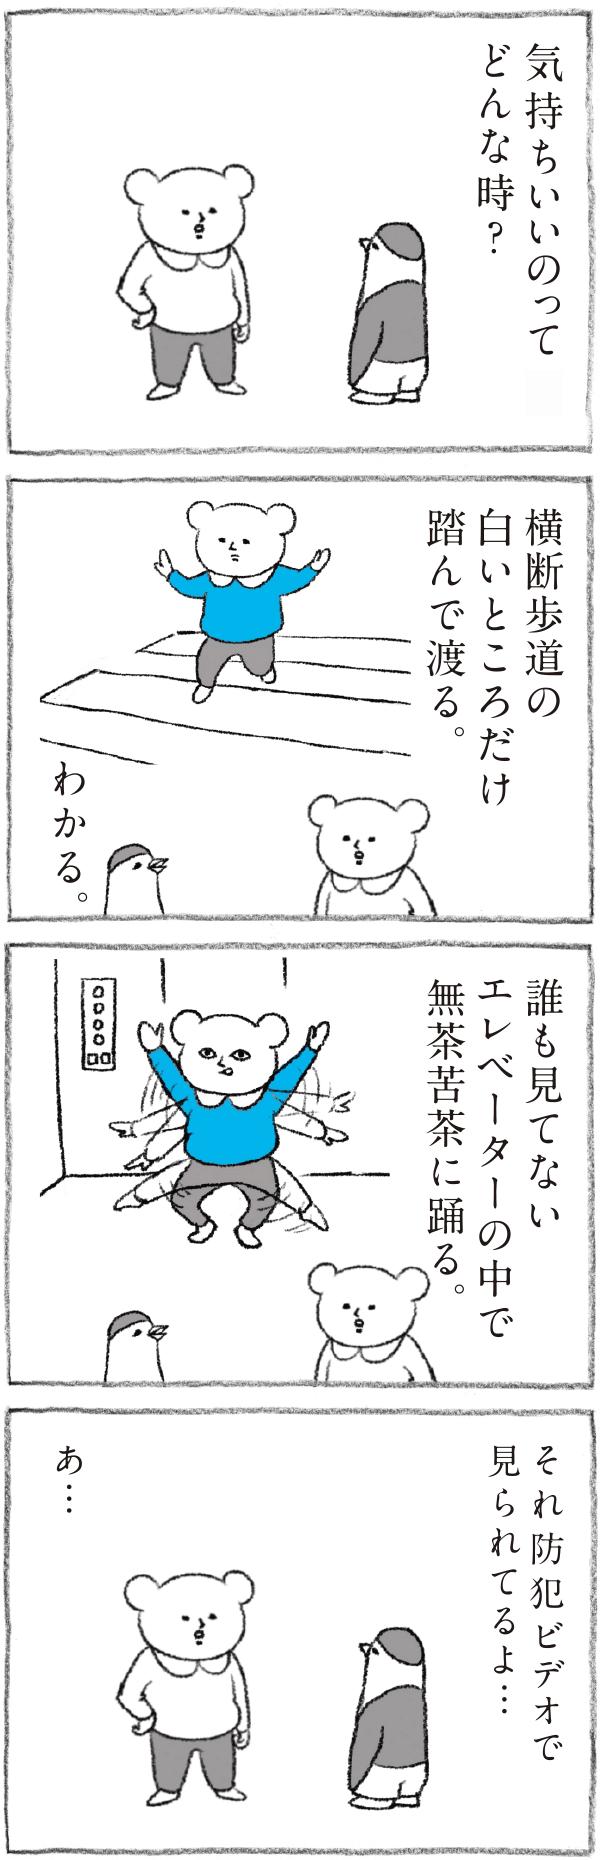 Hanako 1196号:おかわり自由